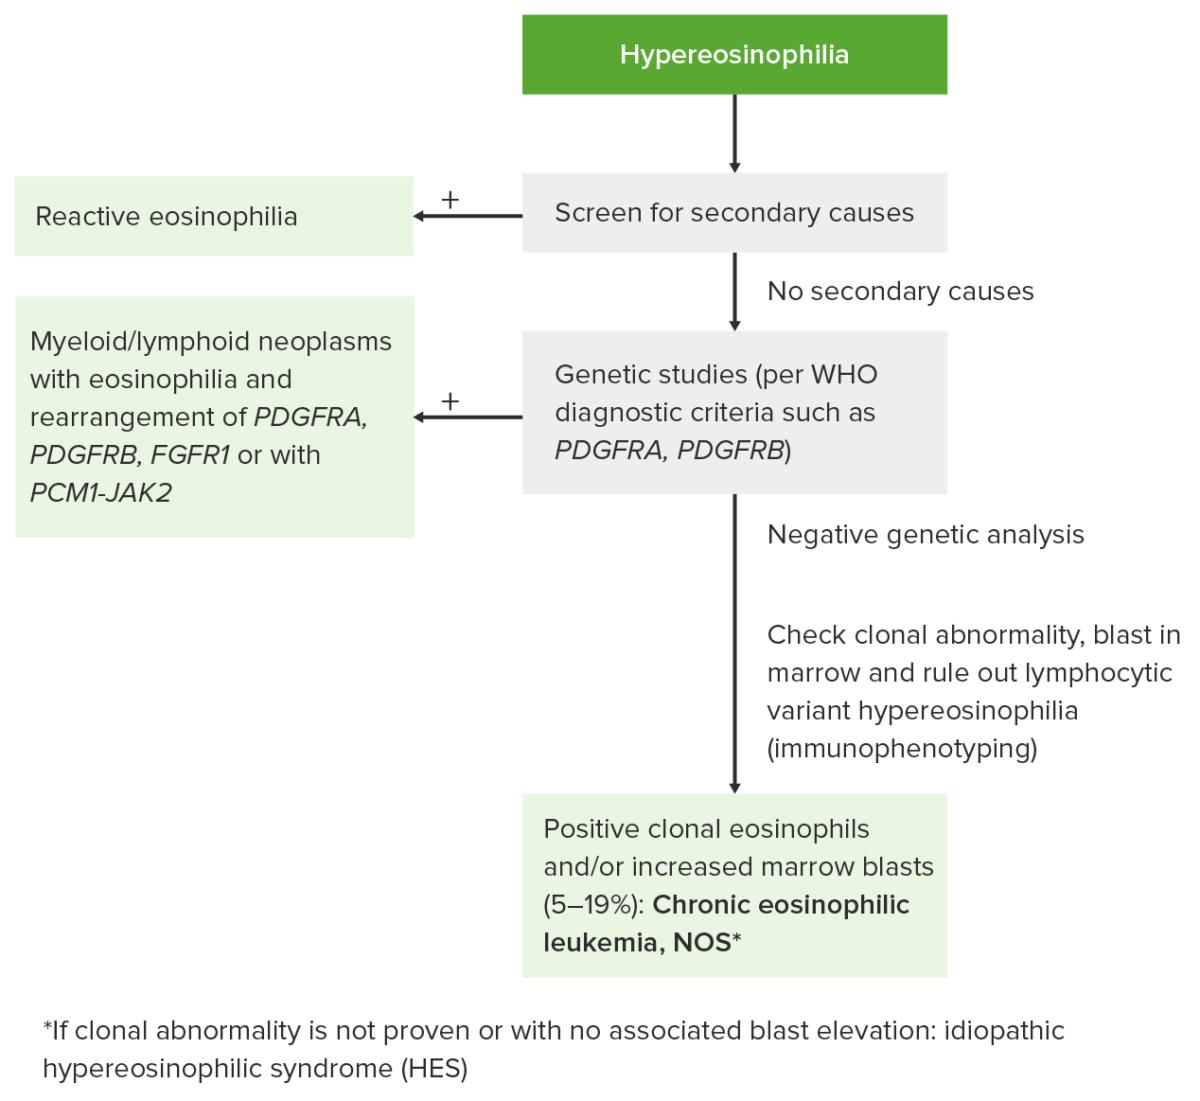 Approach to hypereosinophilia